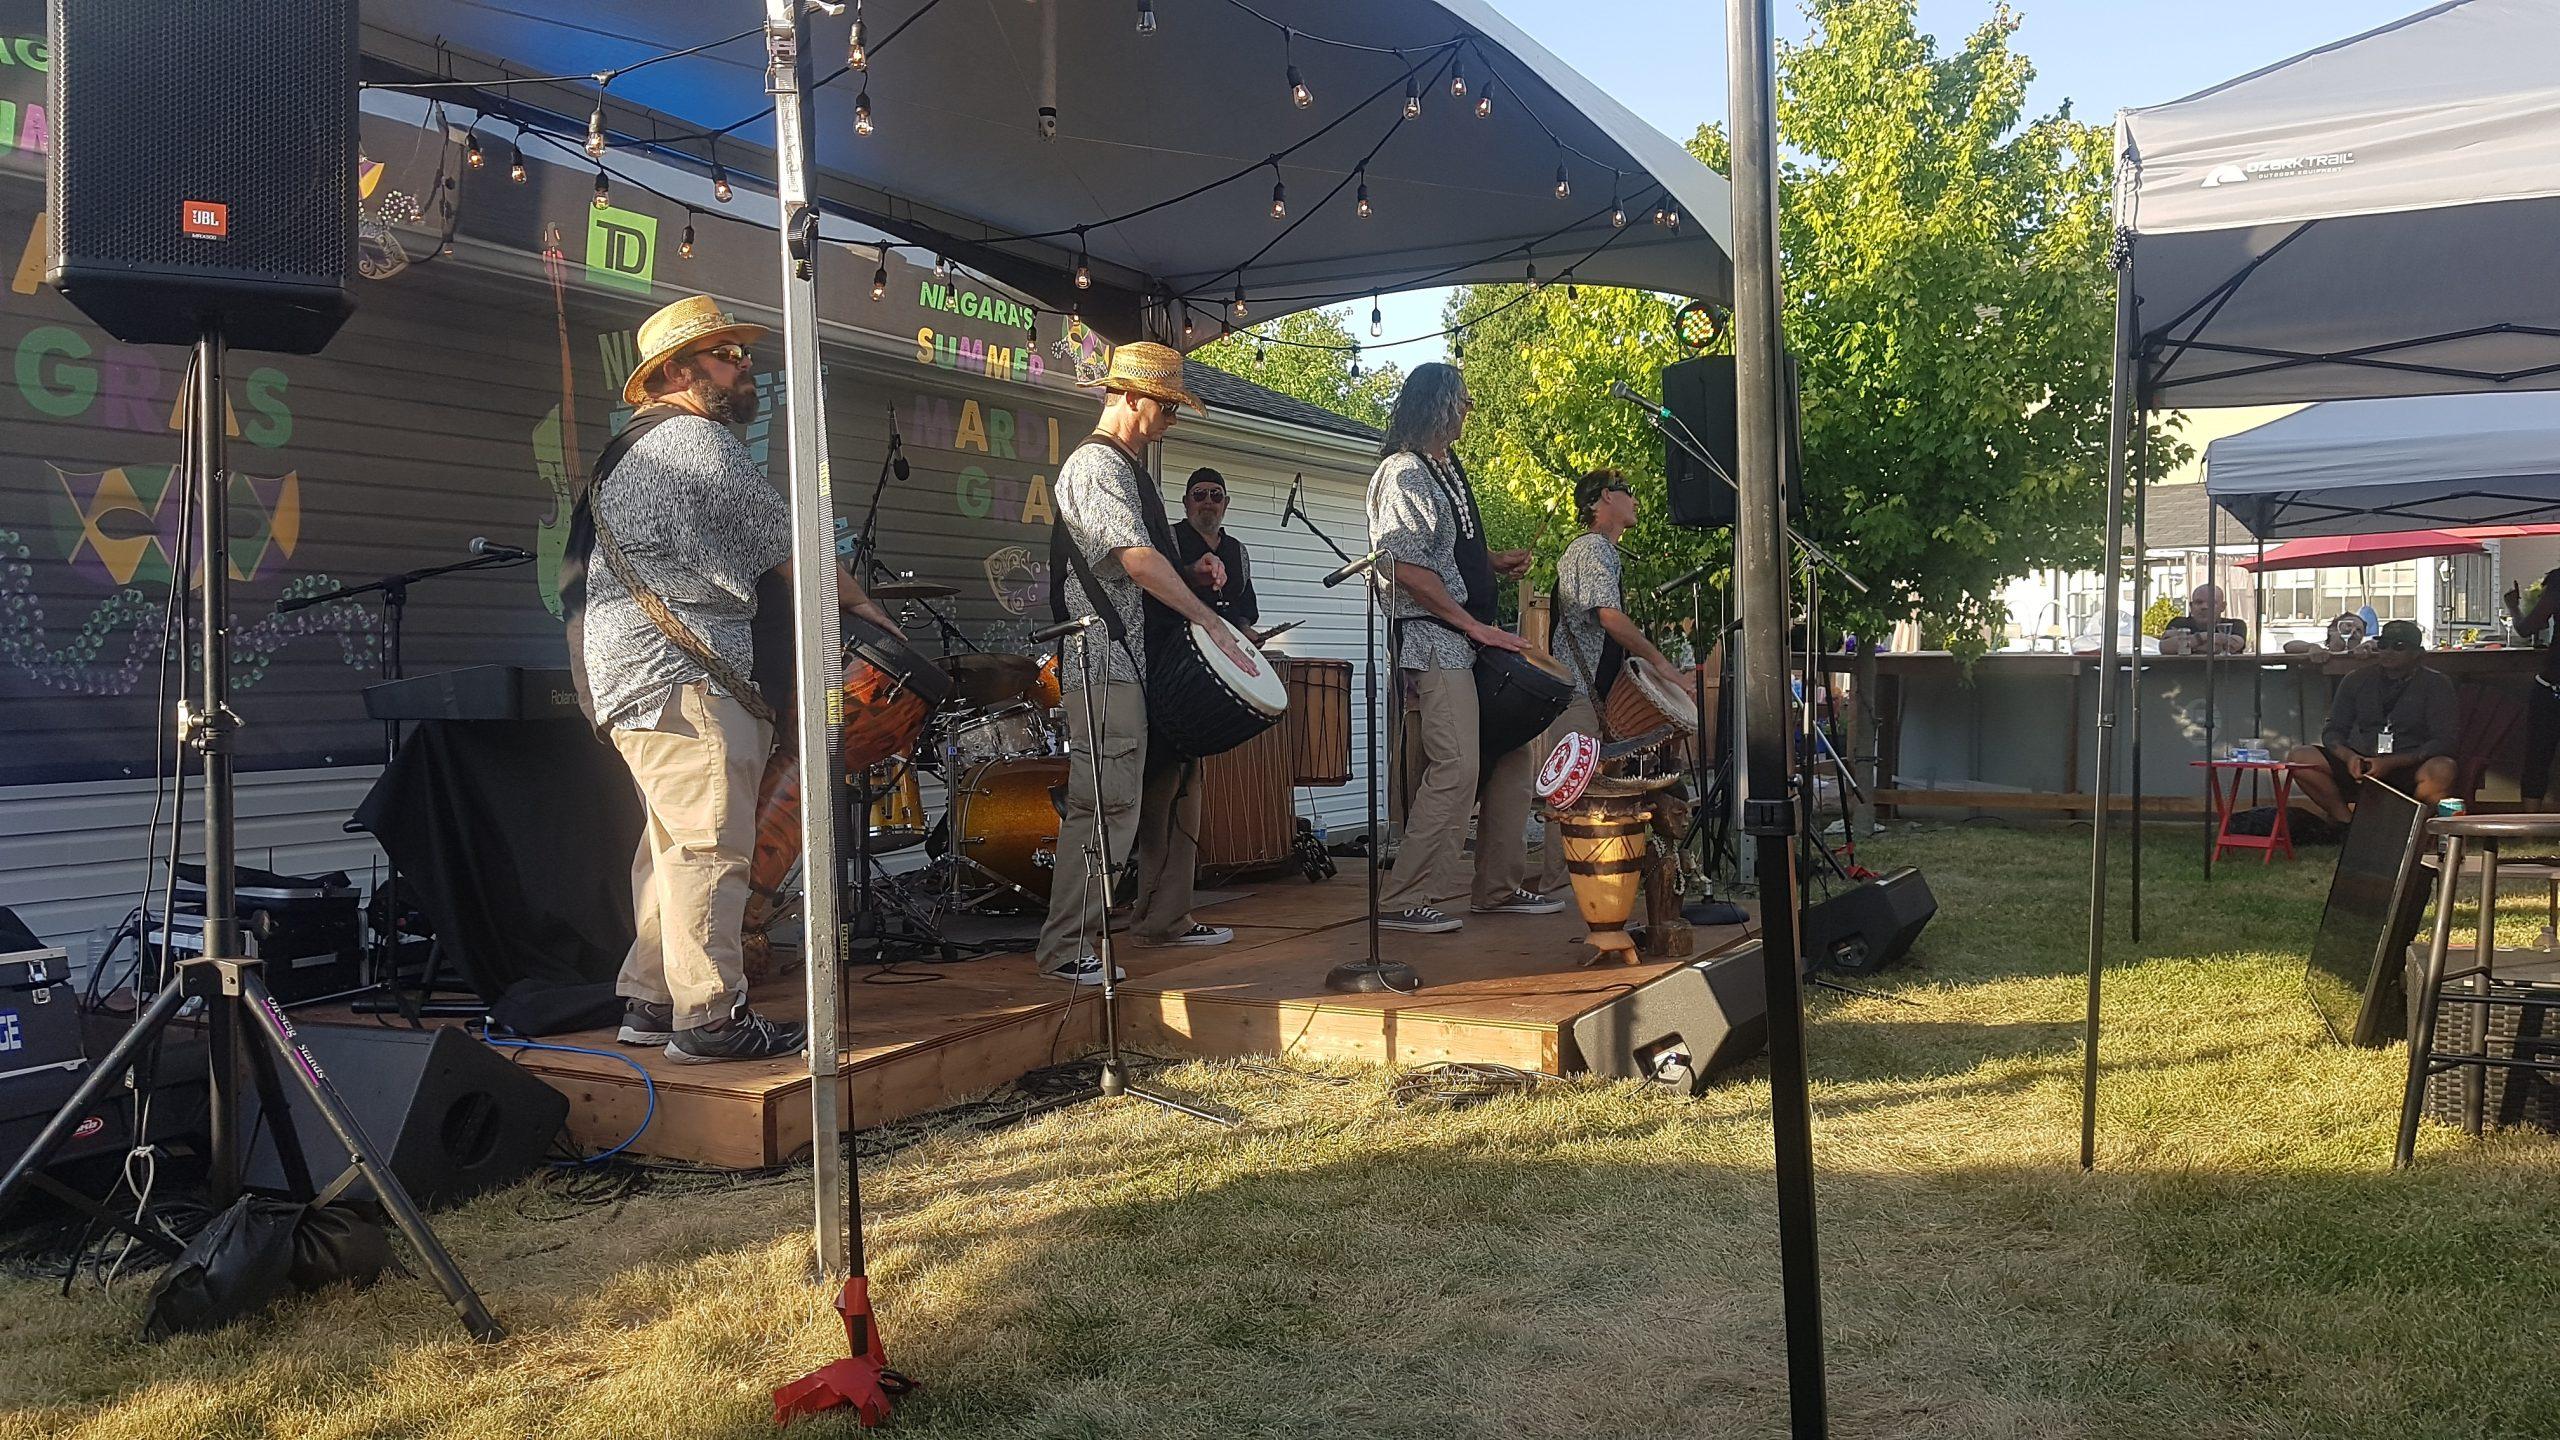 Dragon Ritual Drummers - Niagara's ONLINE Summer Mardi Gras - Saturday, July 18, 2020. Photo: Nicholas Paolone